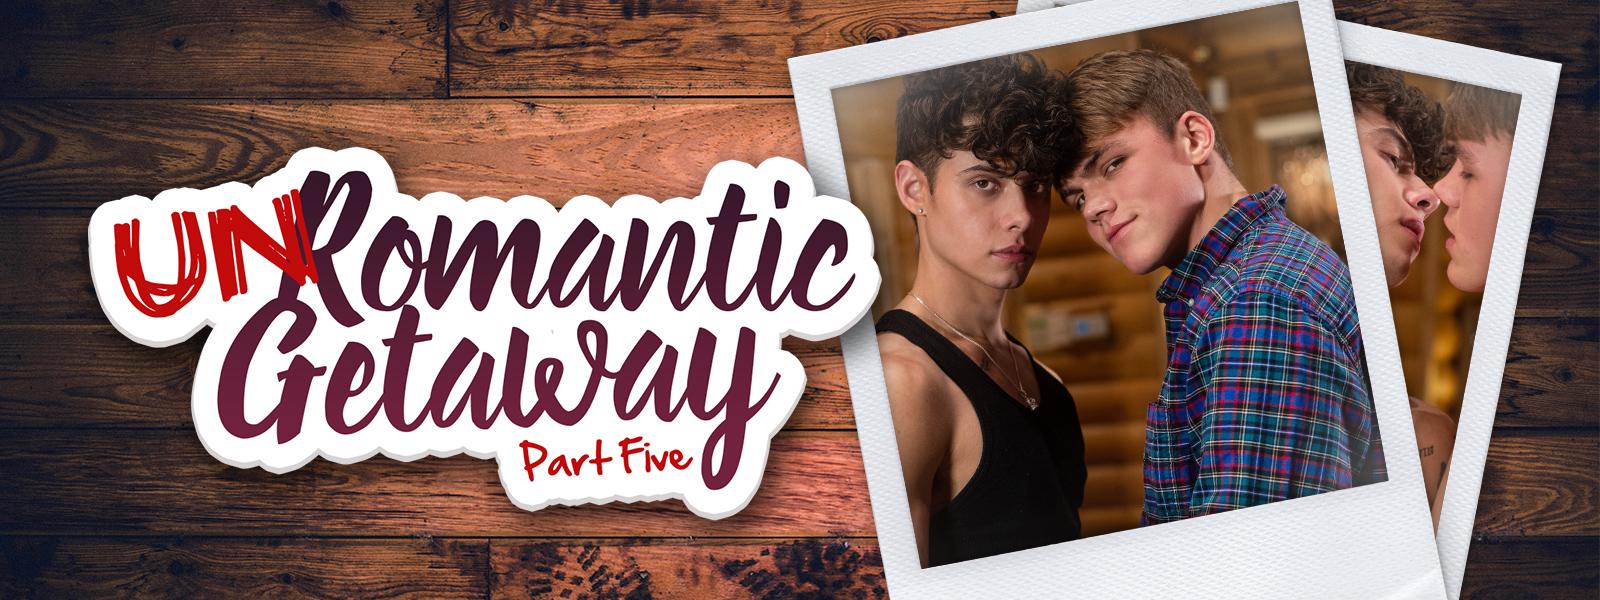 UnRomantic Getaway: Part Five